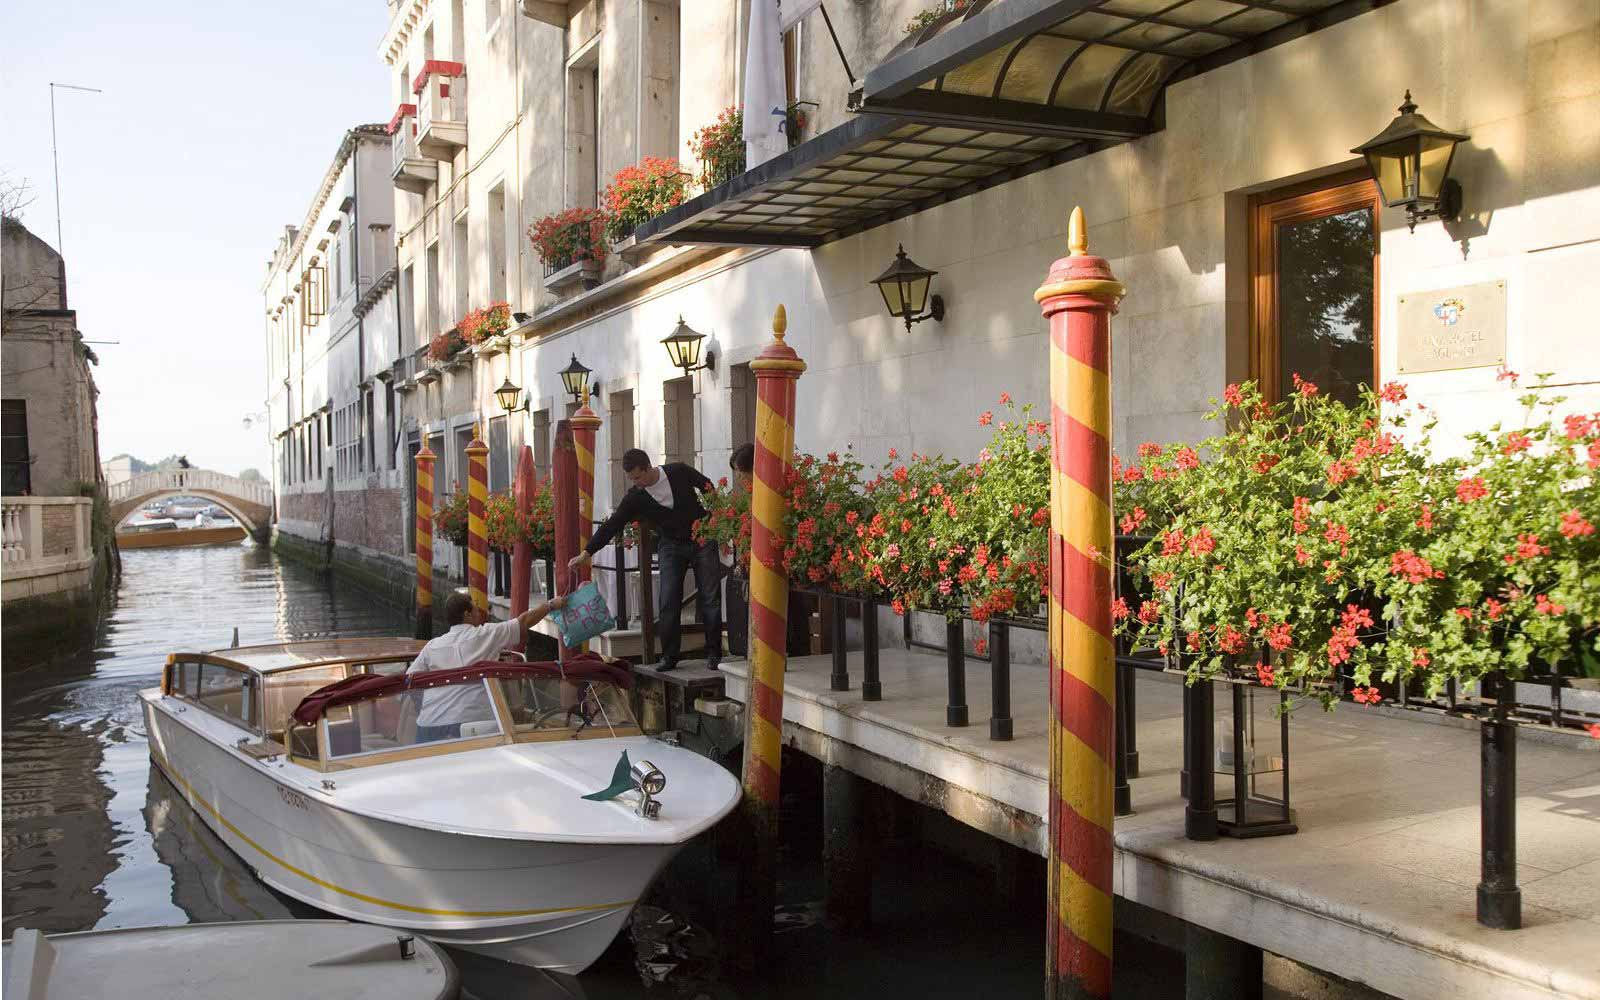 Arrival by boat at Luna Hotel Baglioni